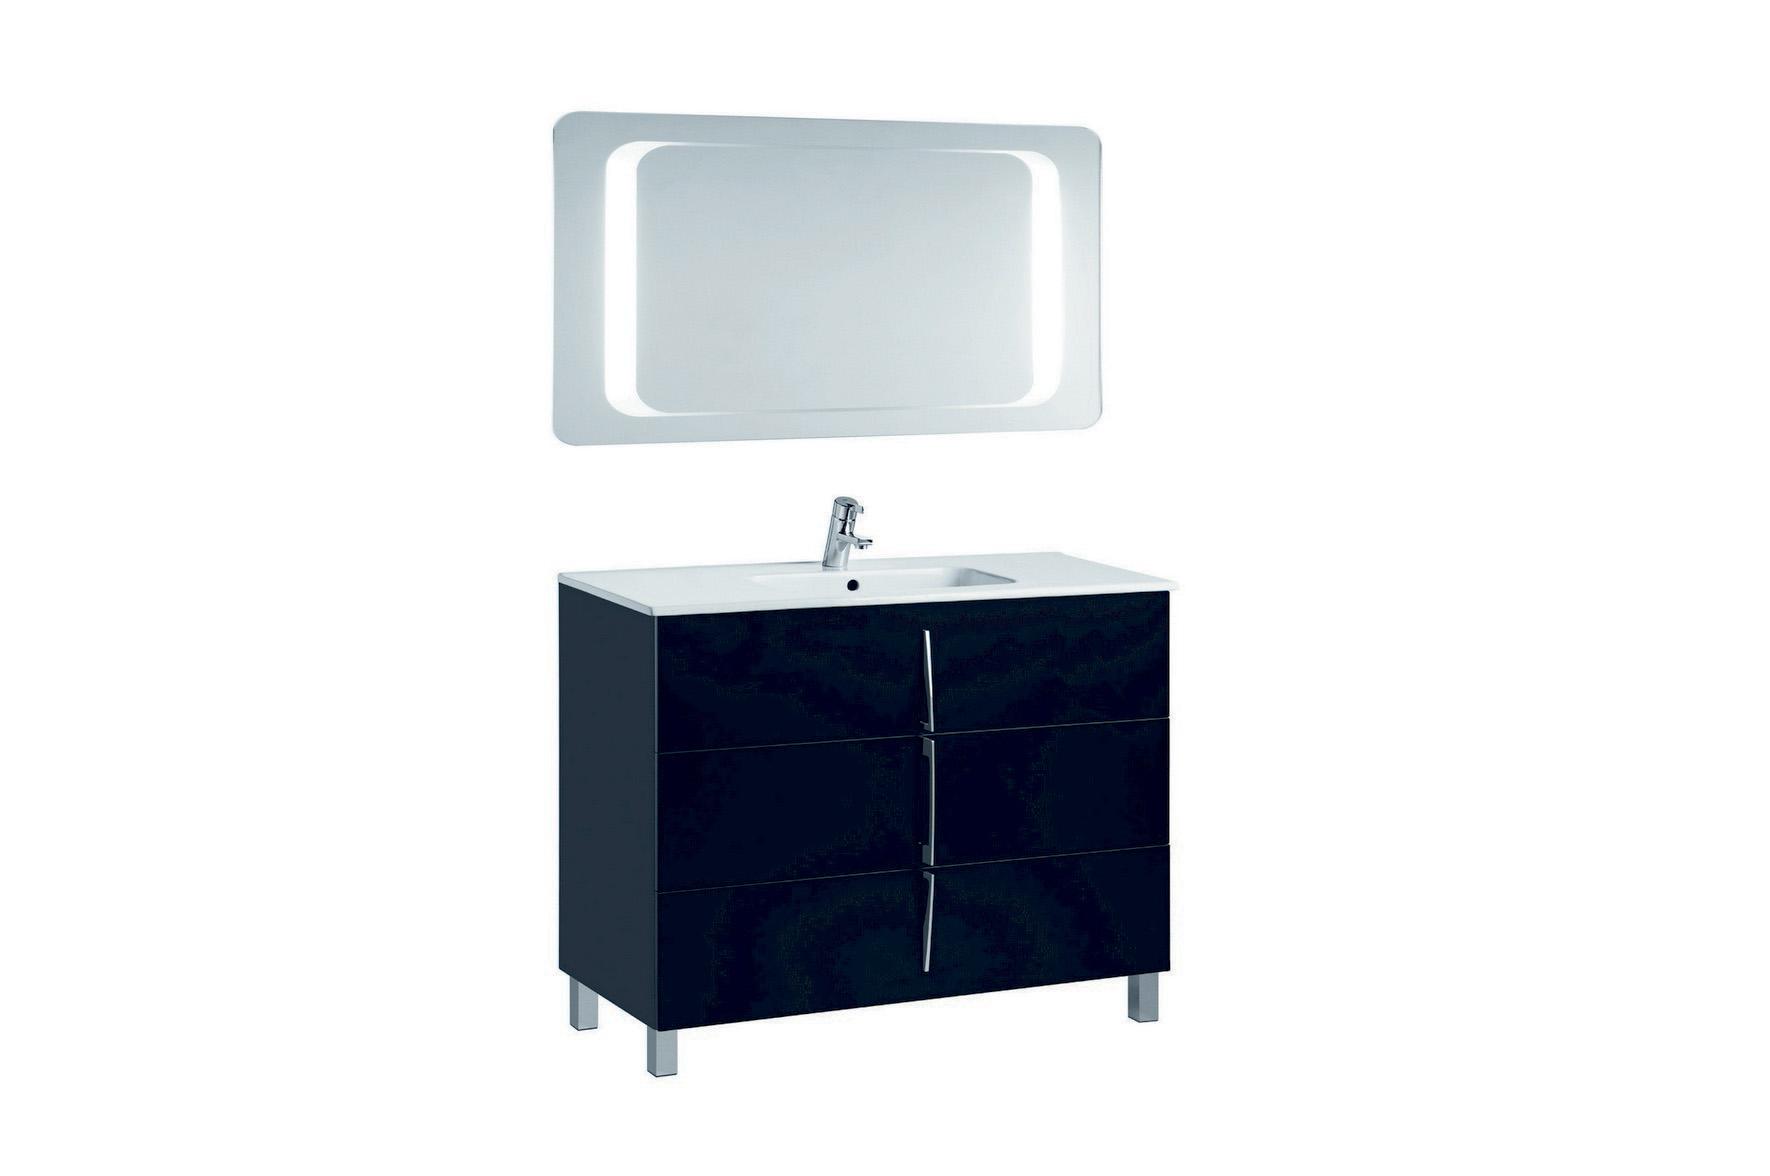 Mobilier negru 100 cm CUARZO 3C cu lavoar Smile si oglinda cu lumina rectangulara GALA - Poza 16